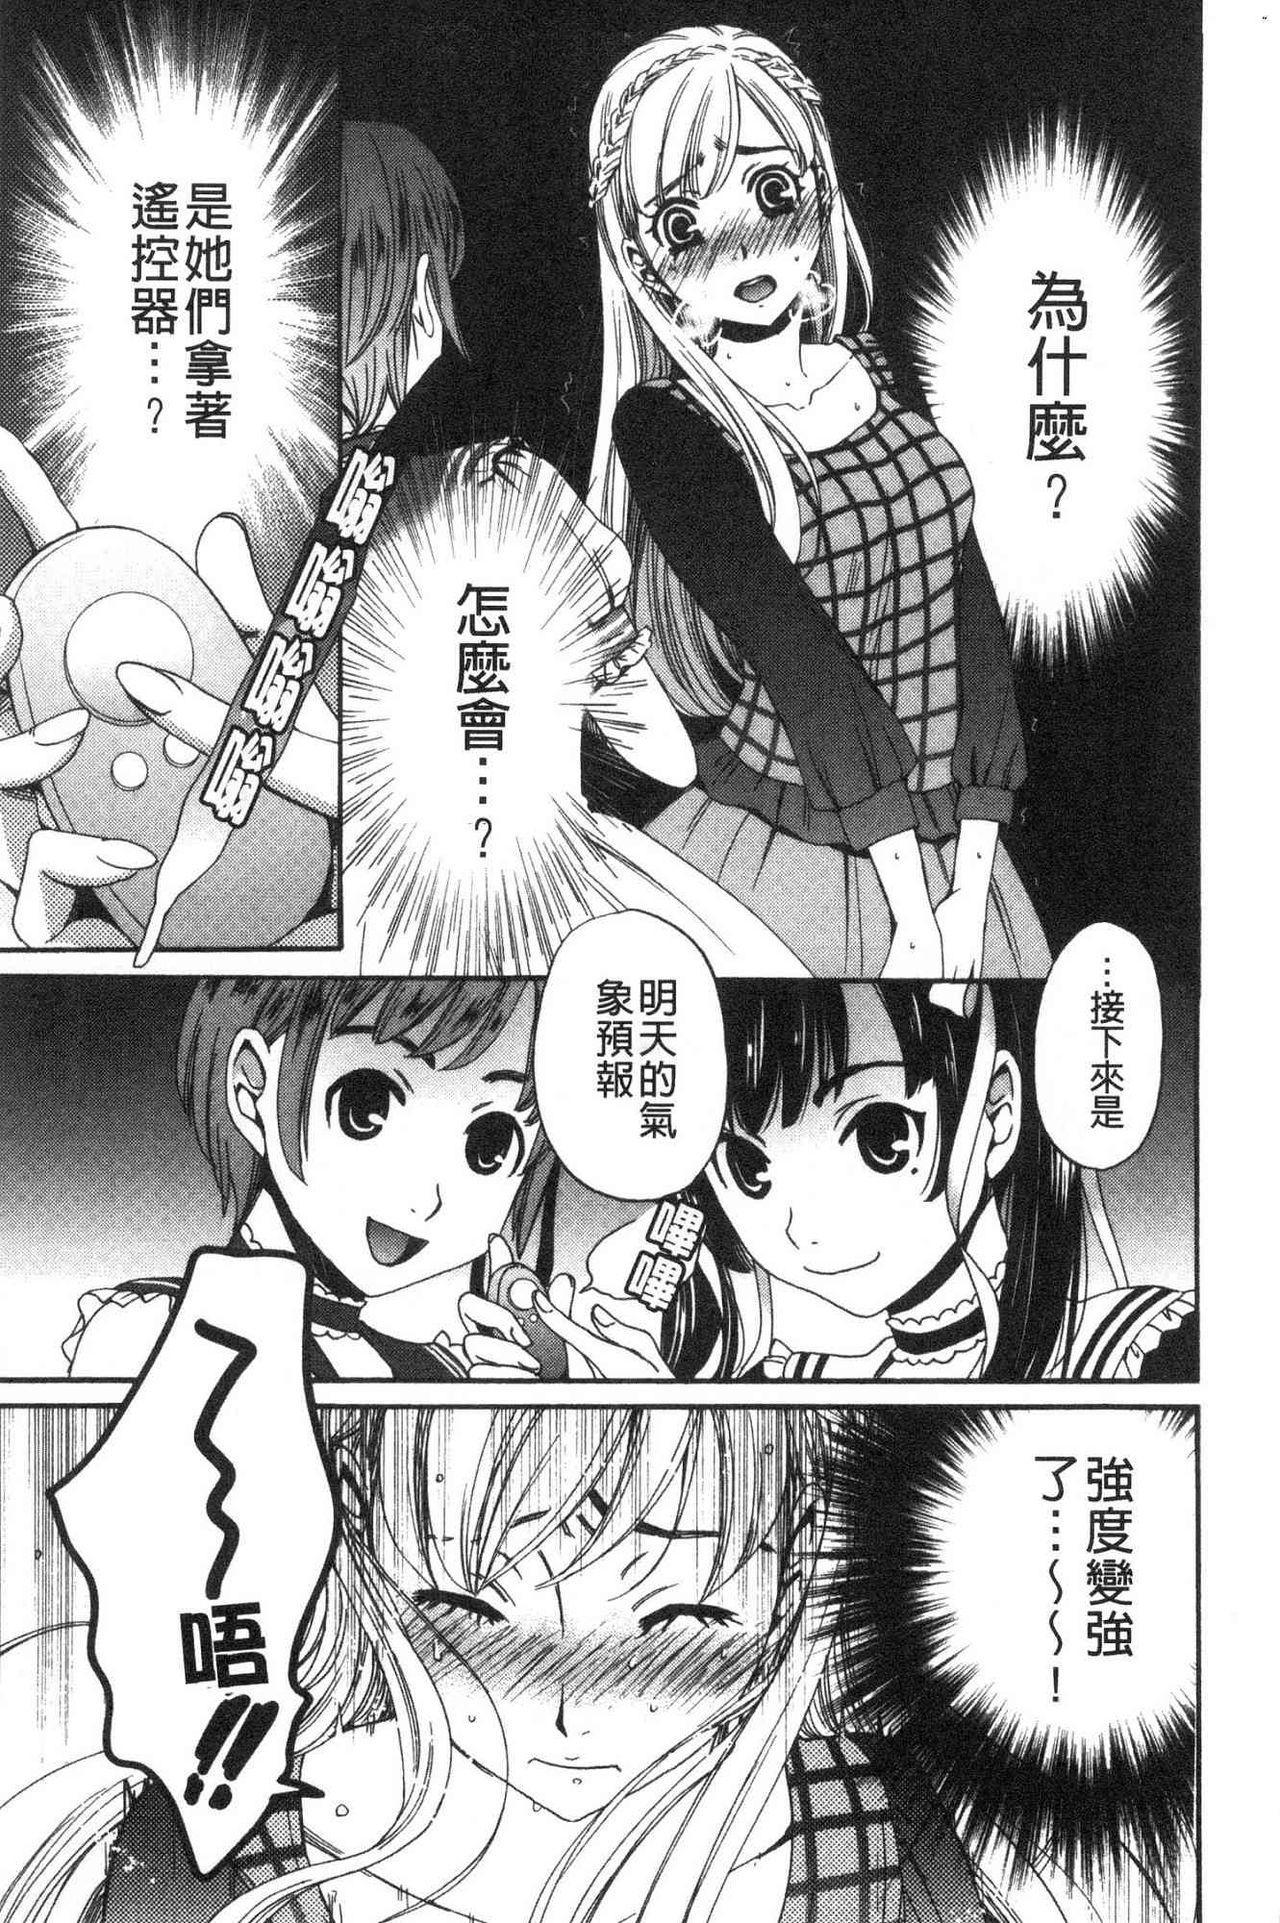 [Gotoh Akira]  21-ji no Onna ~Camera no Mae no Mesuinu~ 2 | 21時之女 ~鏡頭前的牝犬~ 2 [Chinese] 46